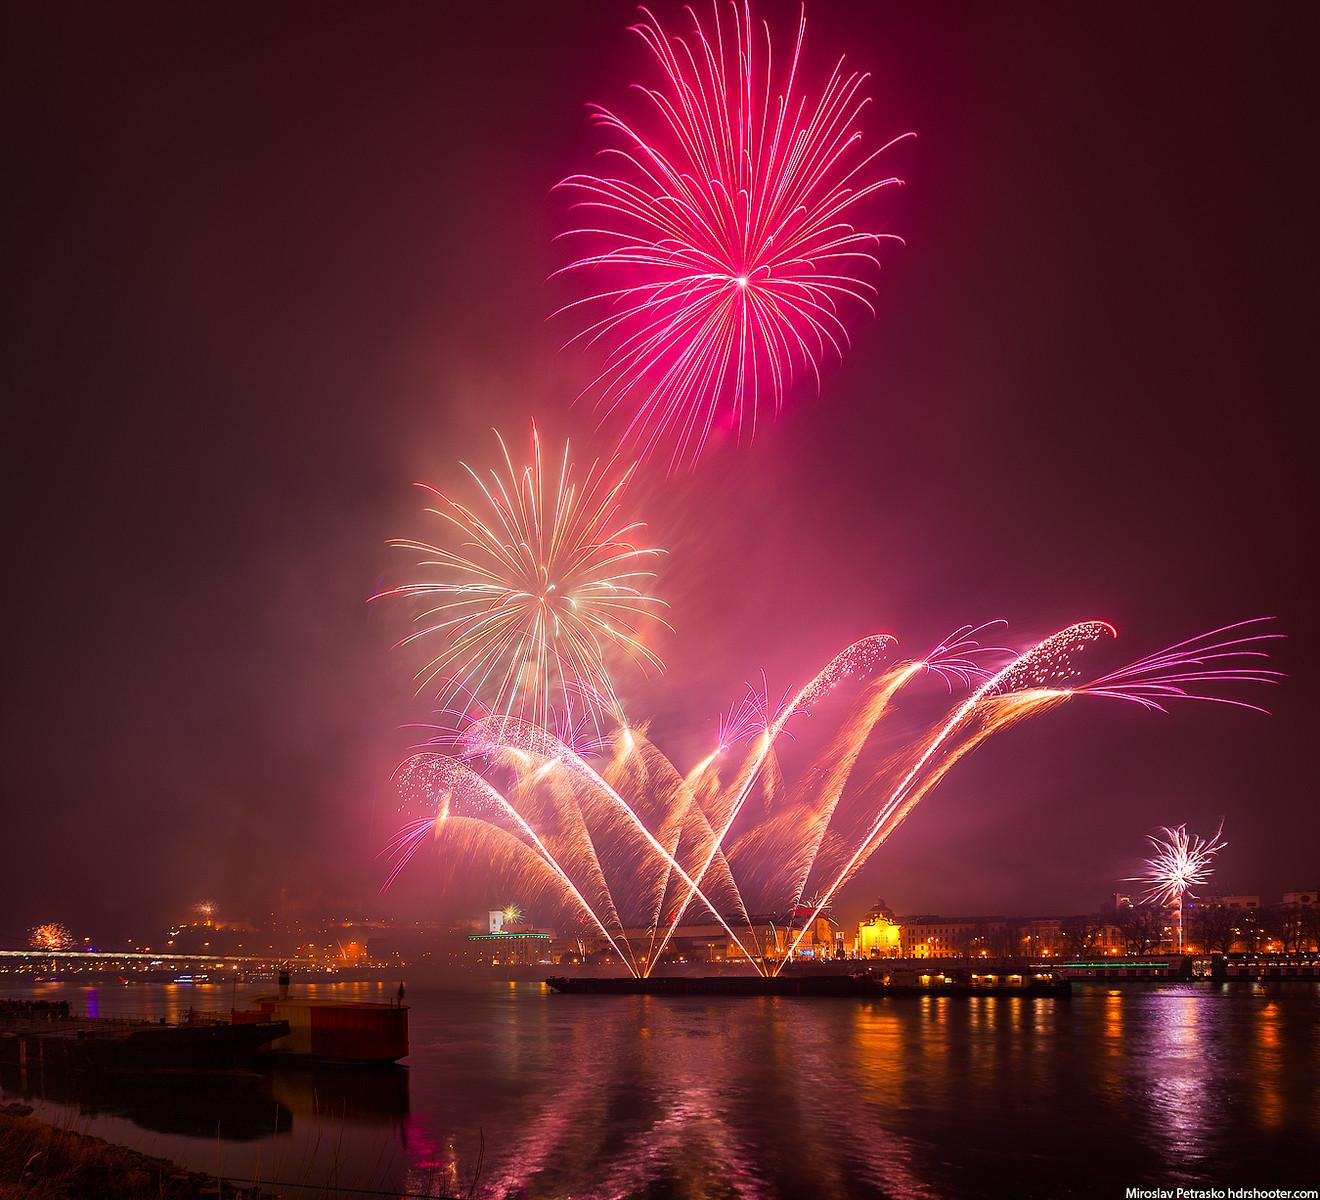 Fireworks over the city, Bratislava, Slovakia